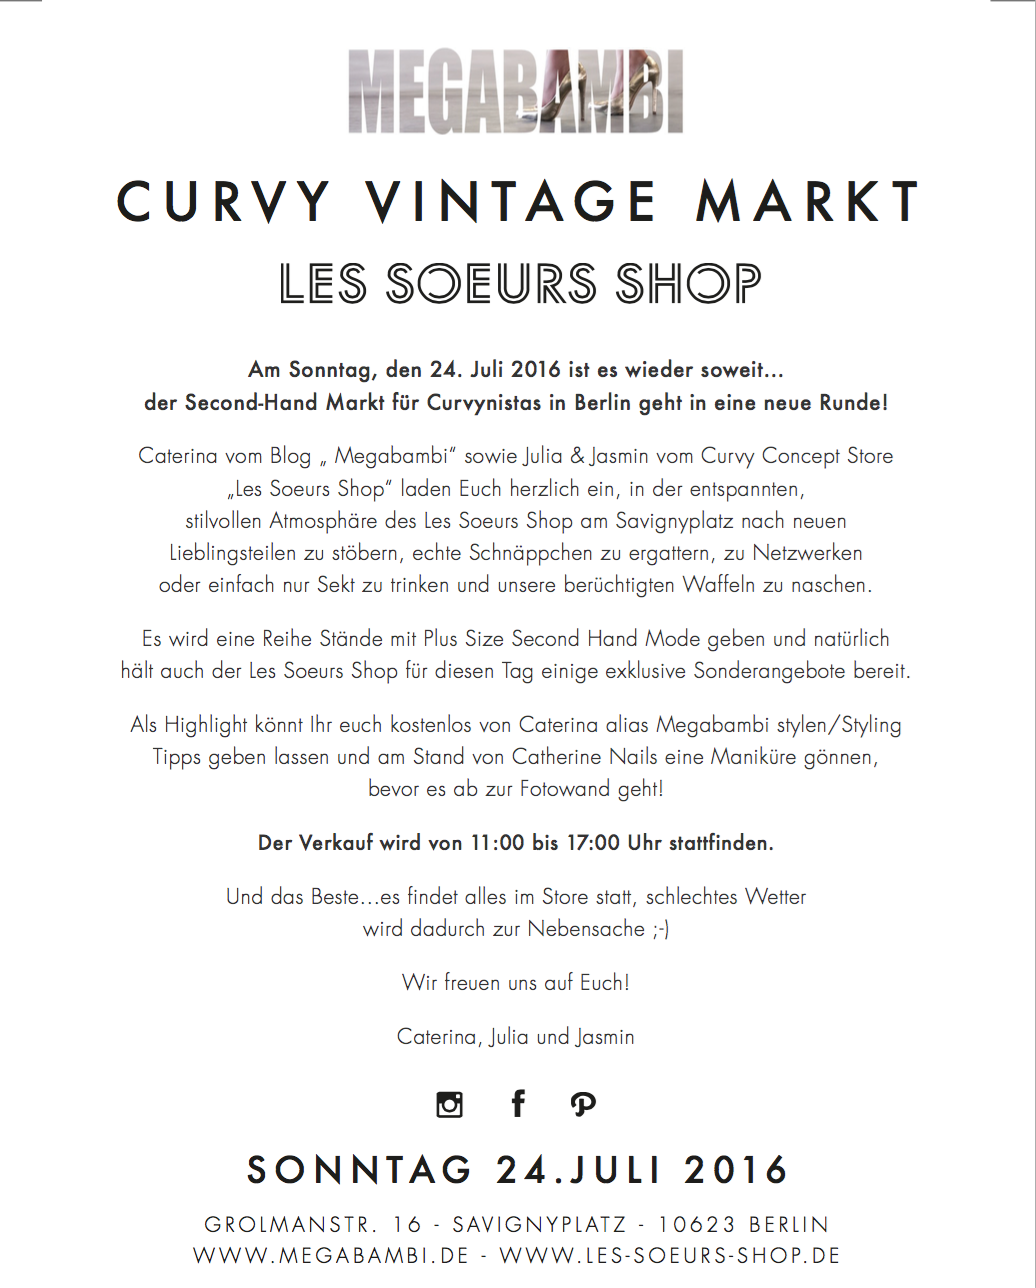 MEgabambis-Curvy-Vinatge _Markt-Les soeurs-shop-MegabambiBlog